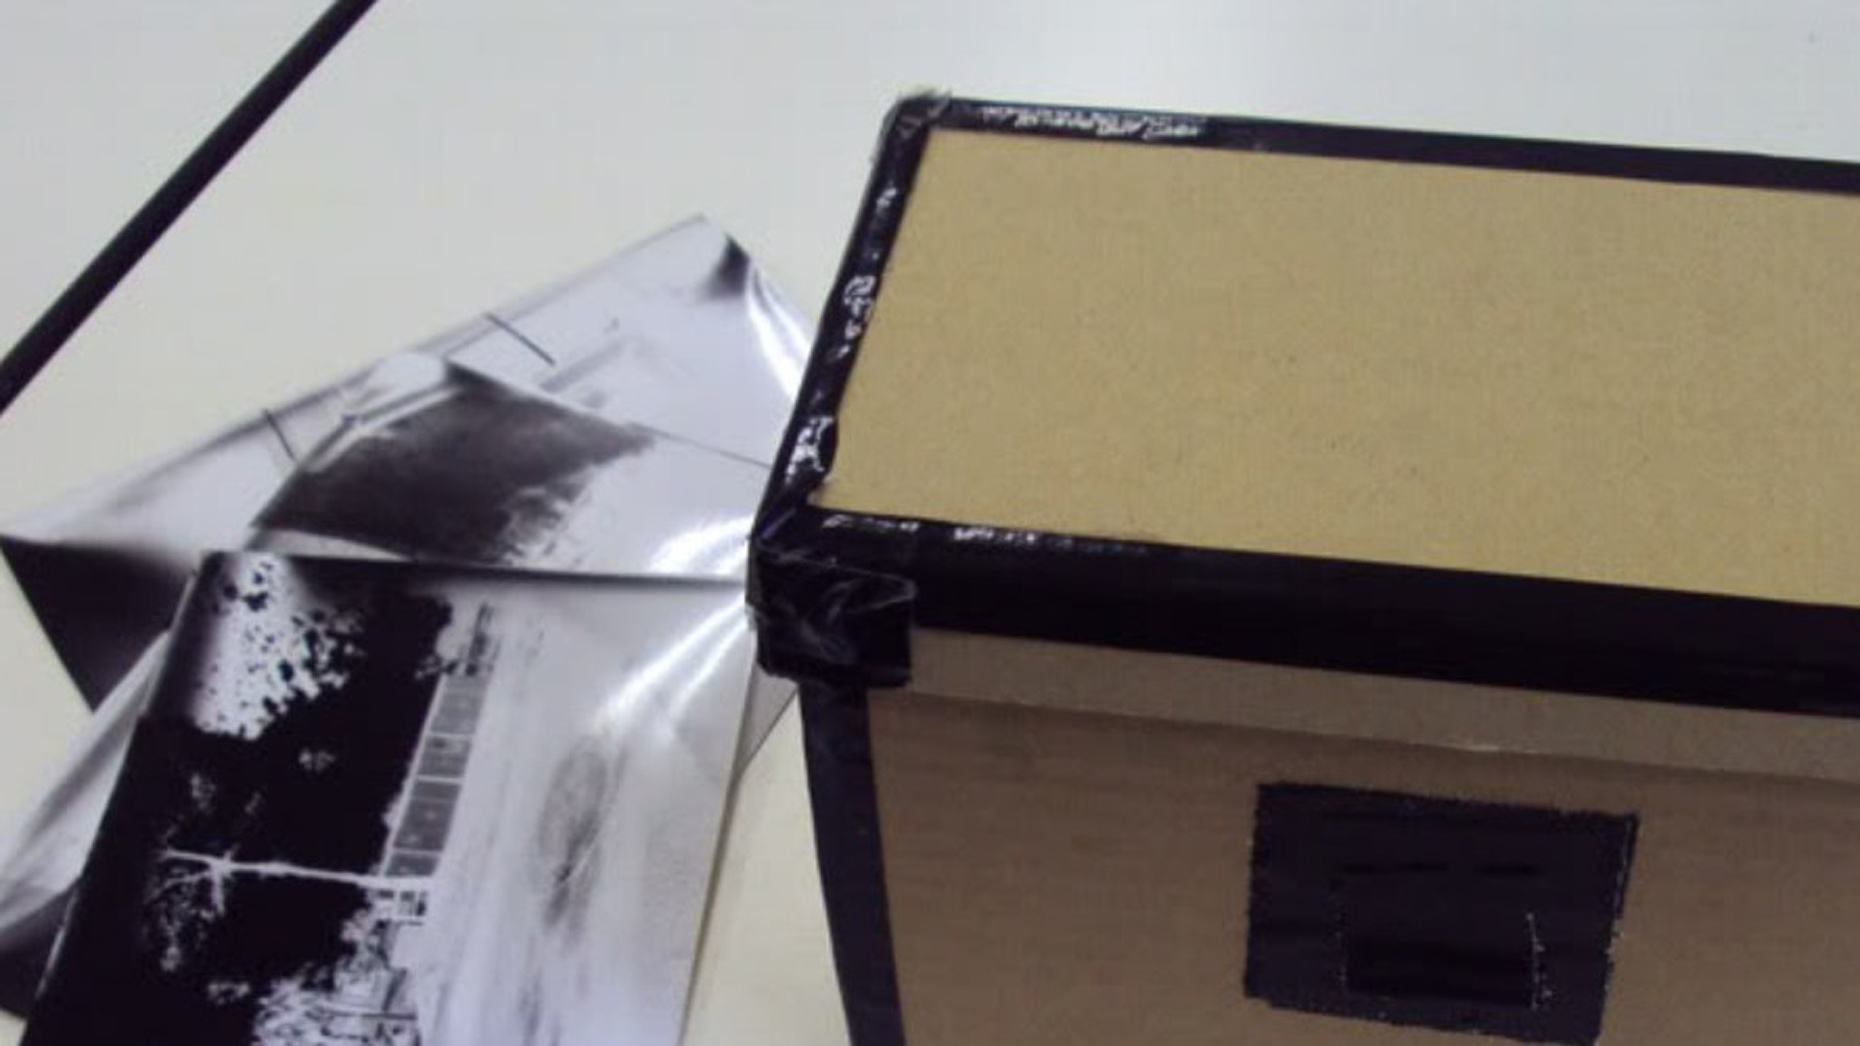 Pinhole camera. Photo: Gravity Fields